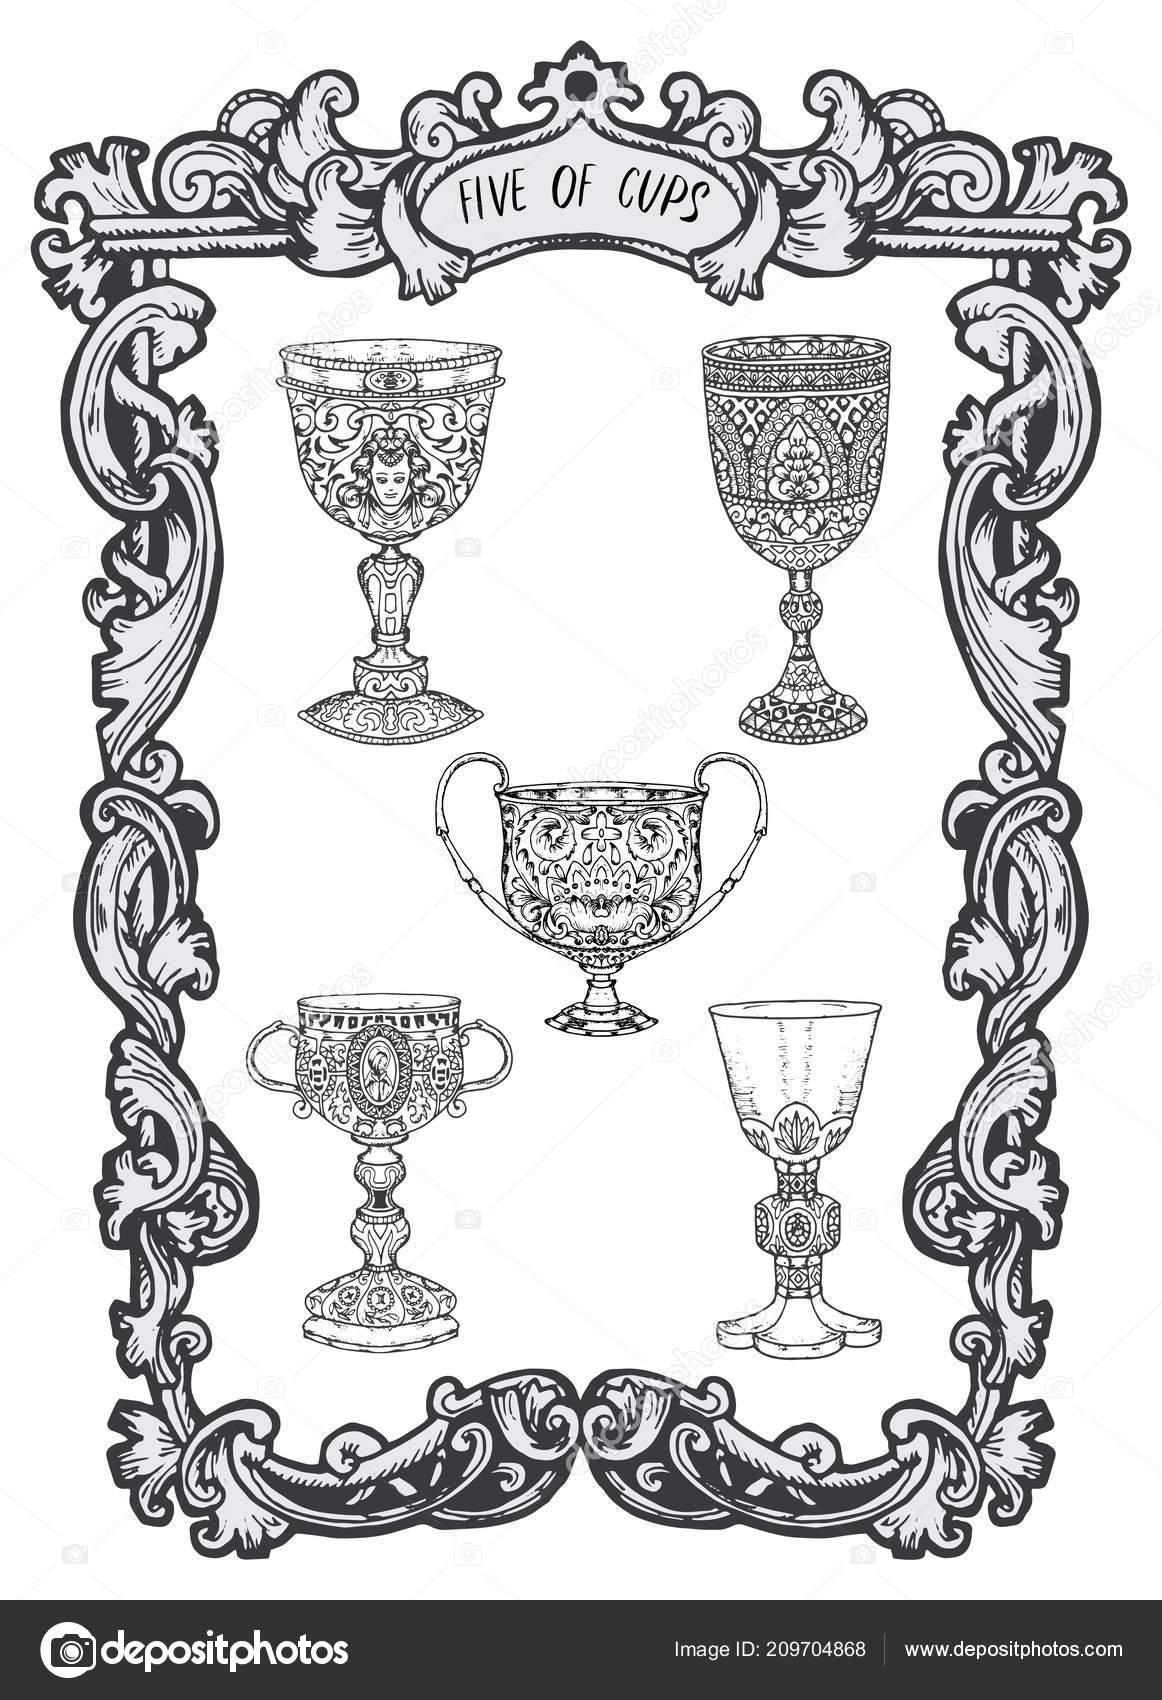 Five Cups Minor Arcana Tarot Card Magic Gate Deck Fantasy Stock